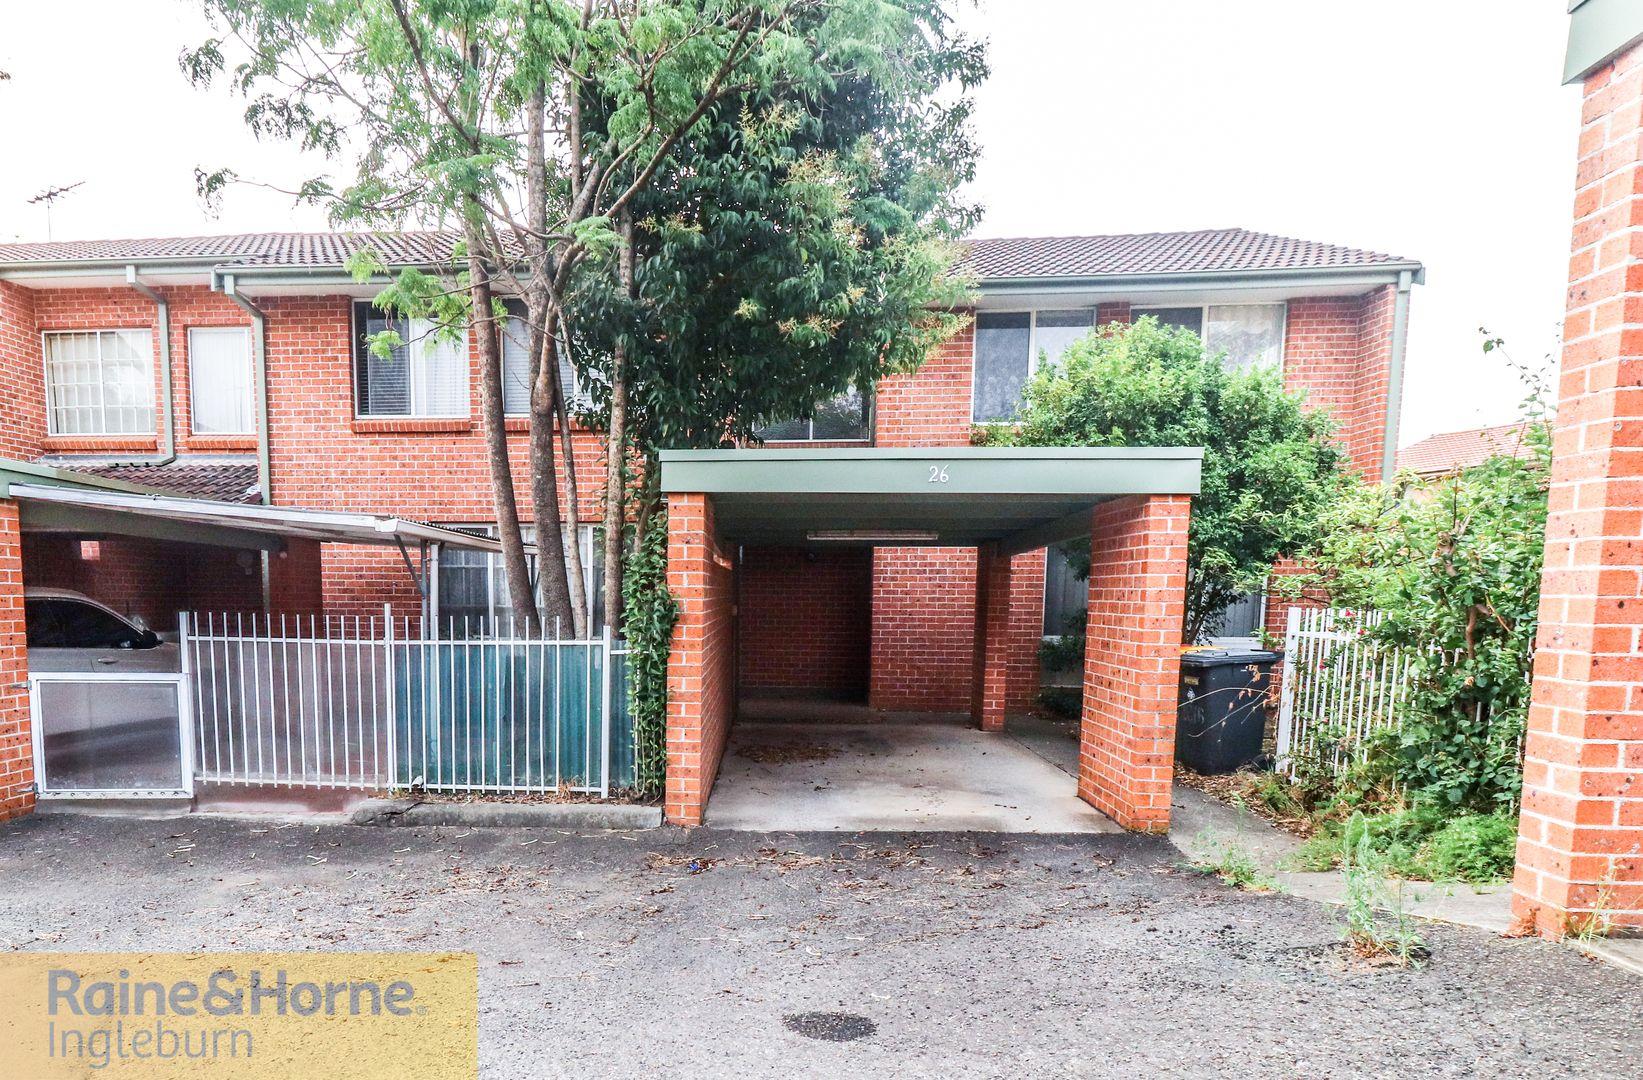 26/6 Jacquinot Place, Glenfield NSW 2167, Image 0